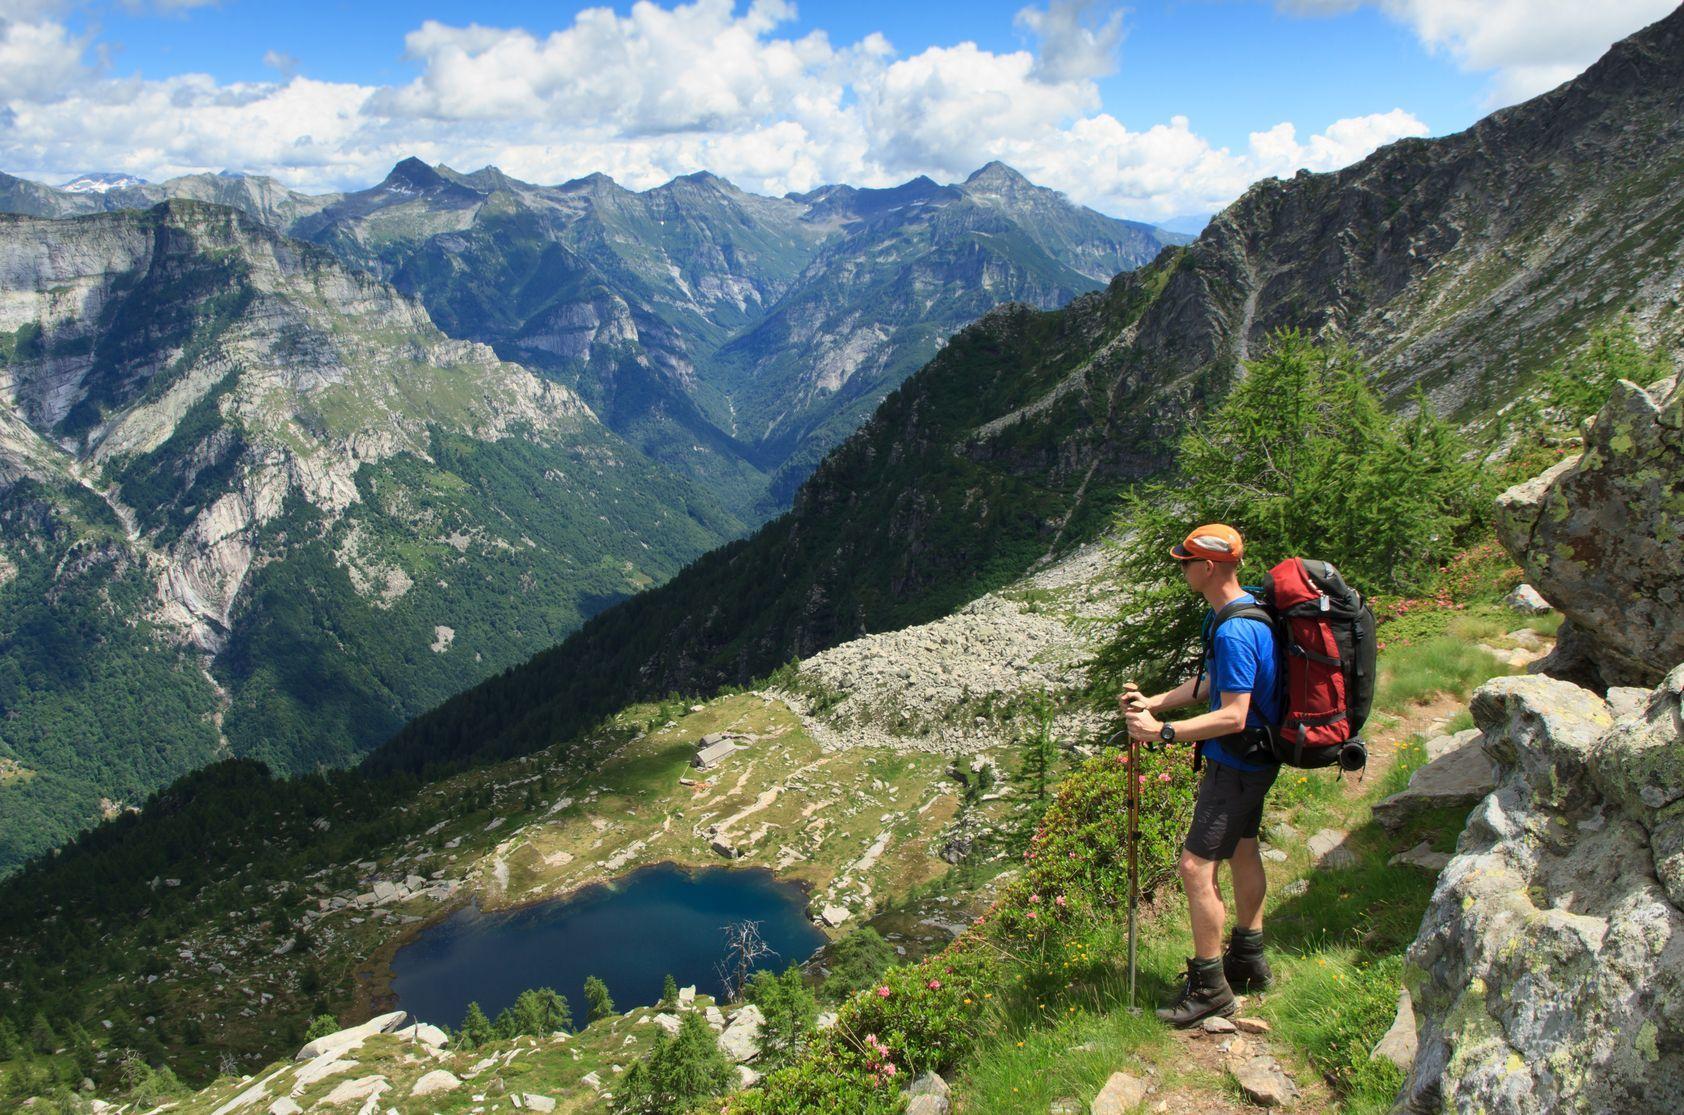 Ticino_Switzerland_hiking in remote areas